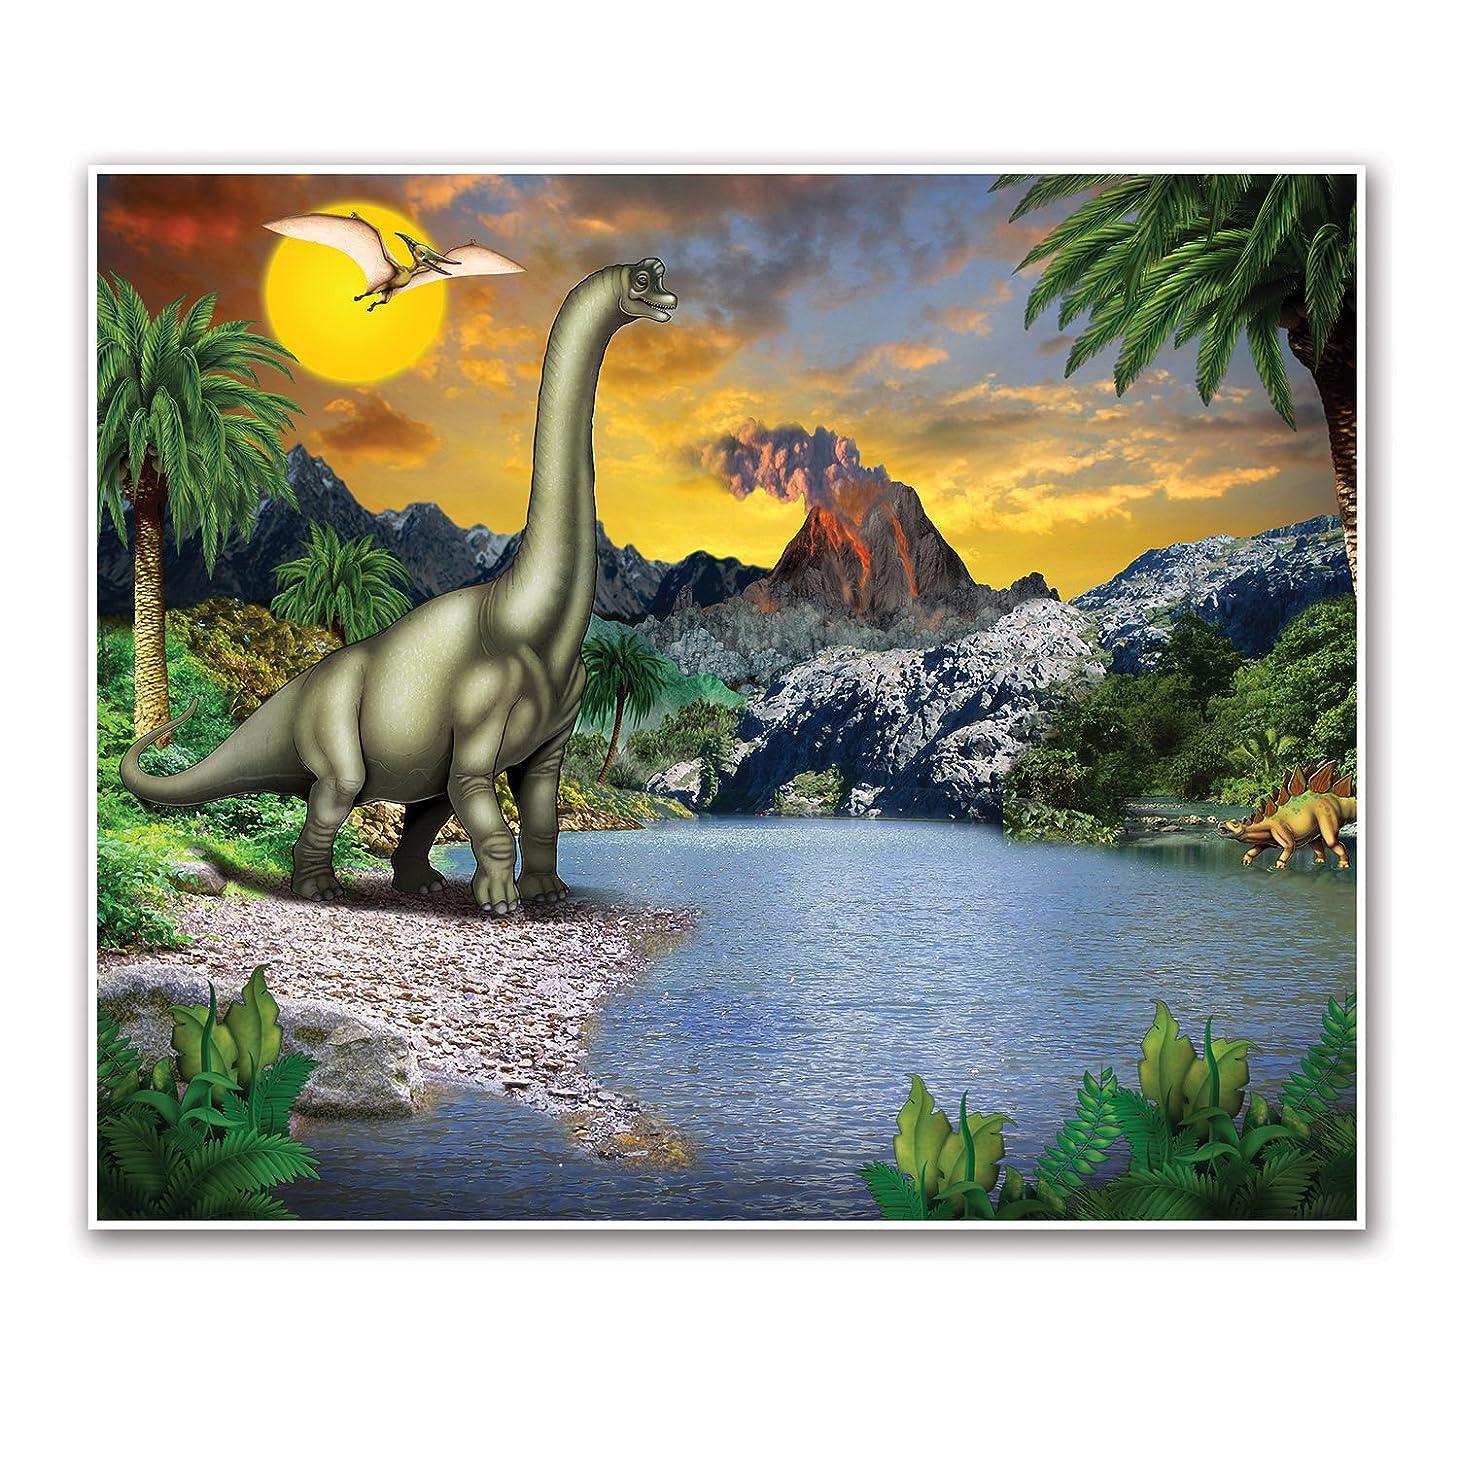 Beistle Dinosaur Insta-Mural Wall Decor | Dinosaur Theme Birthday Party Supplies & Decoration